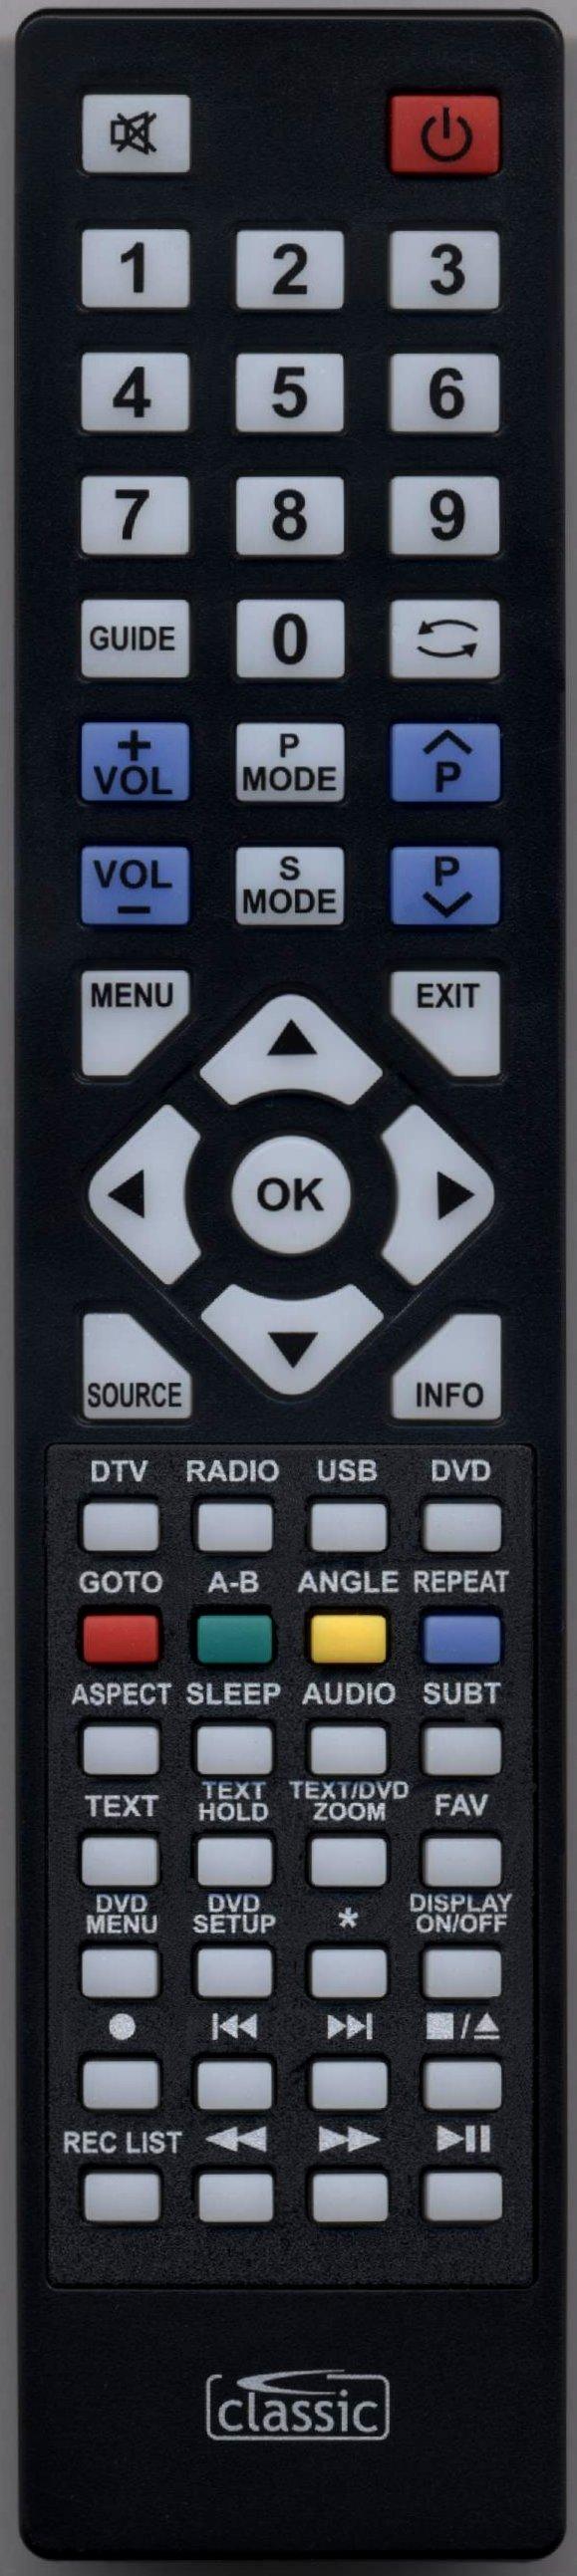 BLAUPUNKT 40/133O-WB-11B-FEGP-UK Remote Control